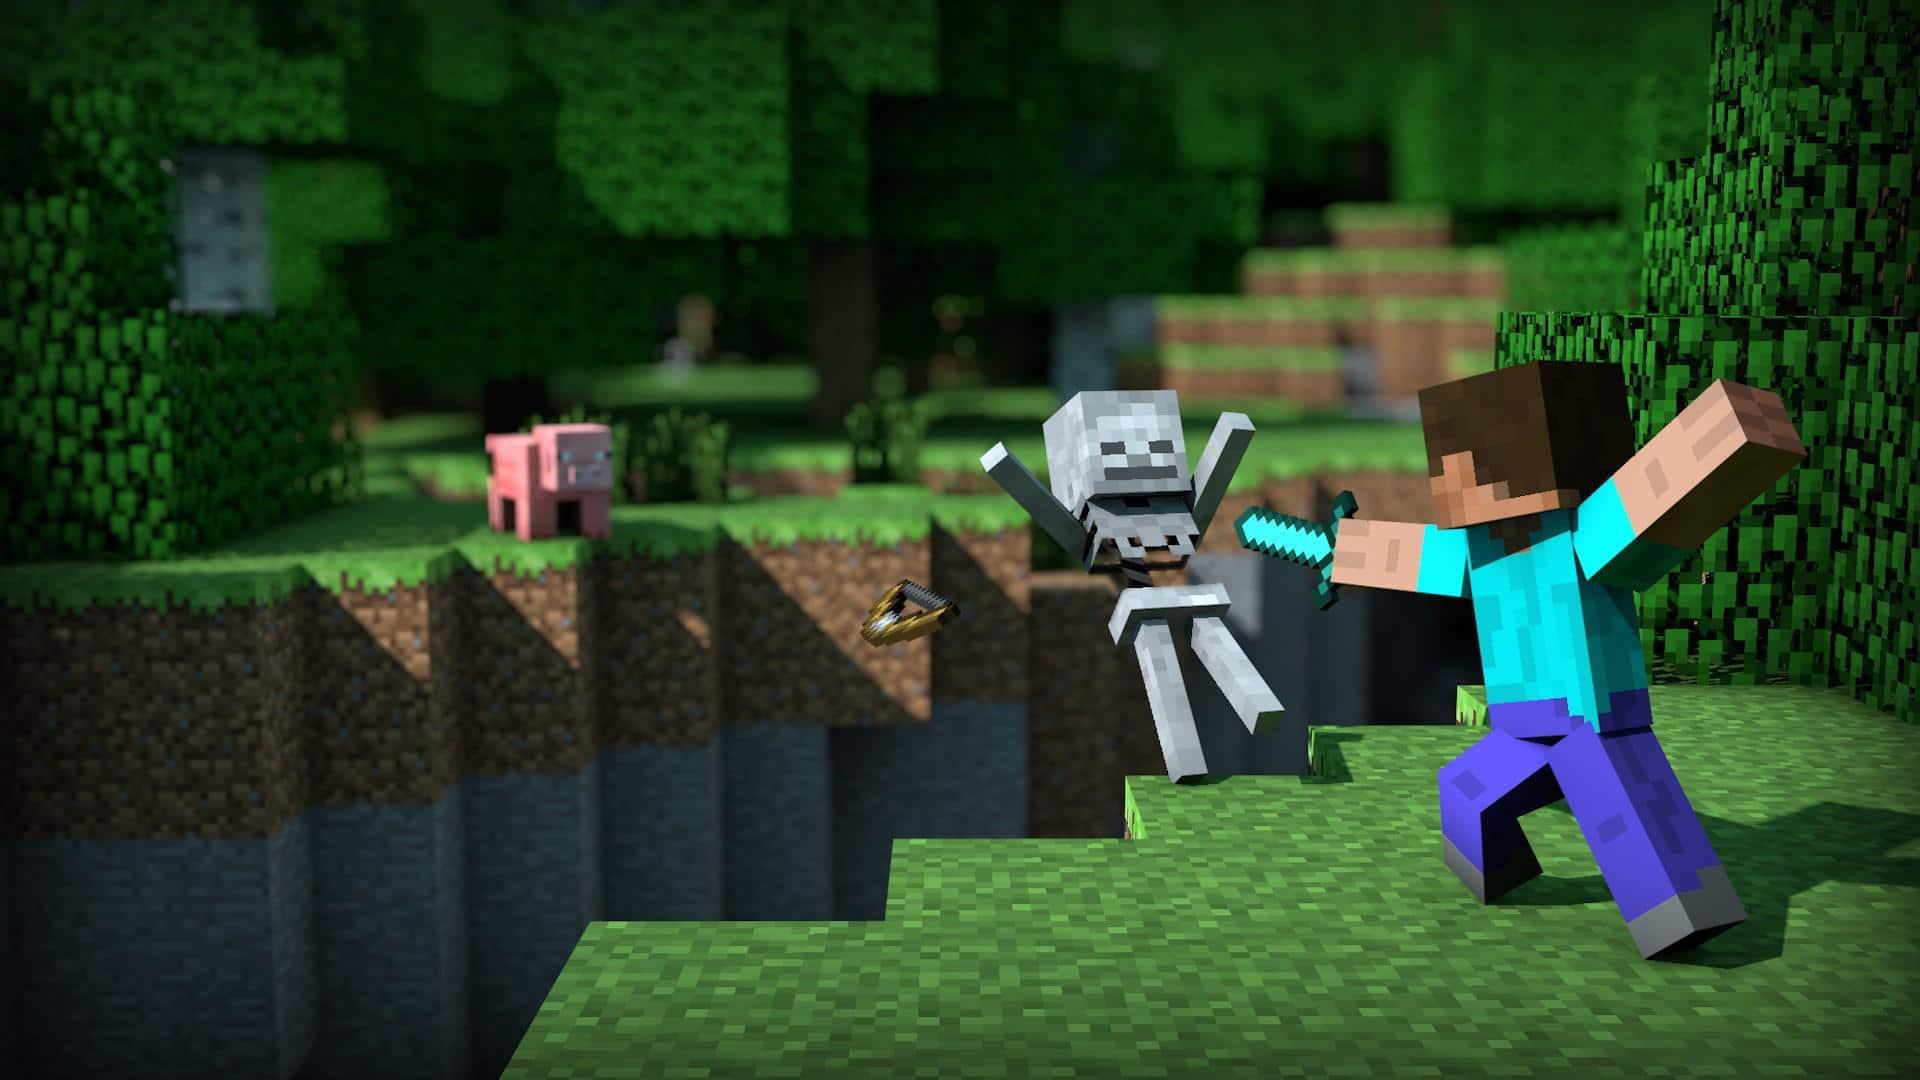 Minecraft en Nintendo Switch aumentó a calidad 1080p - GamersRD.com